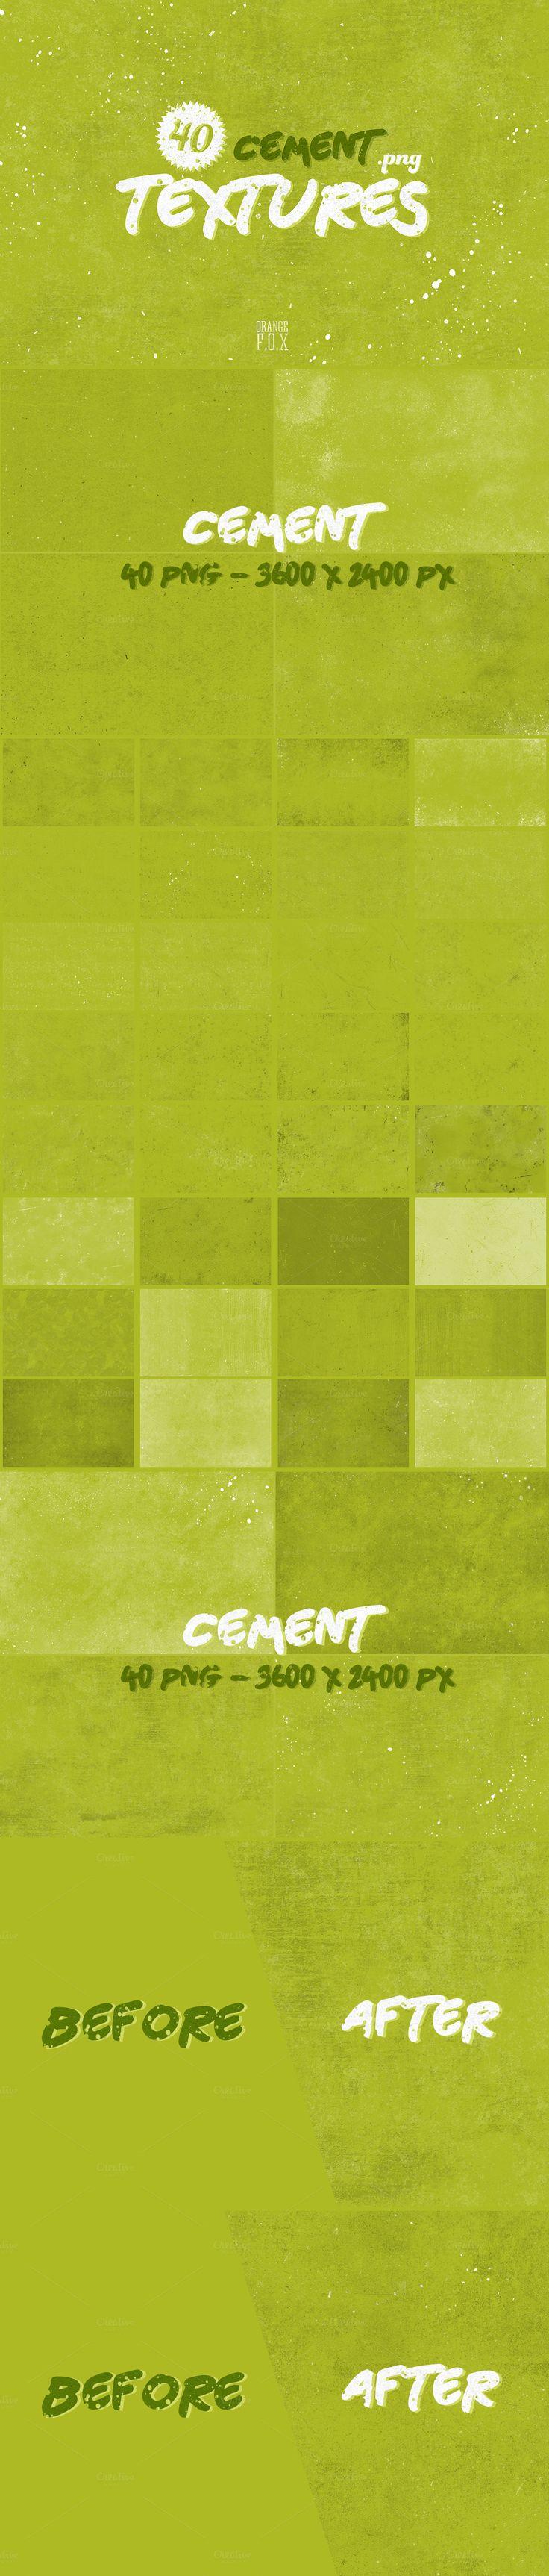 40 Cement Textures by OrangeFox on @creativemarket  #cement  #concrete #textures #grunge #subtle #texture #asphalt #street  #grunge  #noise #grain #vintage #authentic #weathered #distressed #cement #concrete #street #sidewalk #graffiti #wall